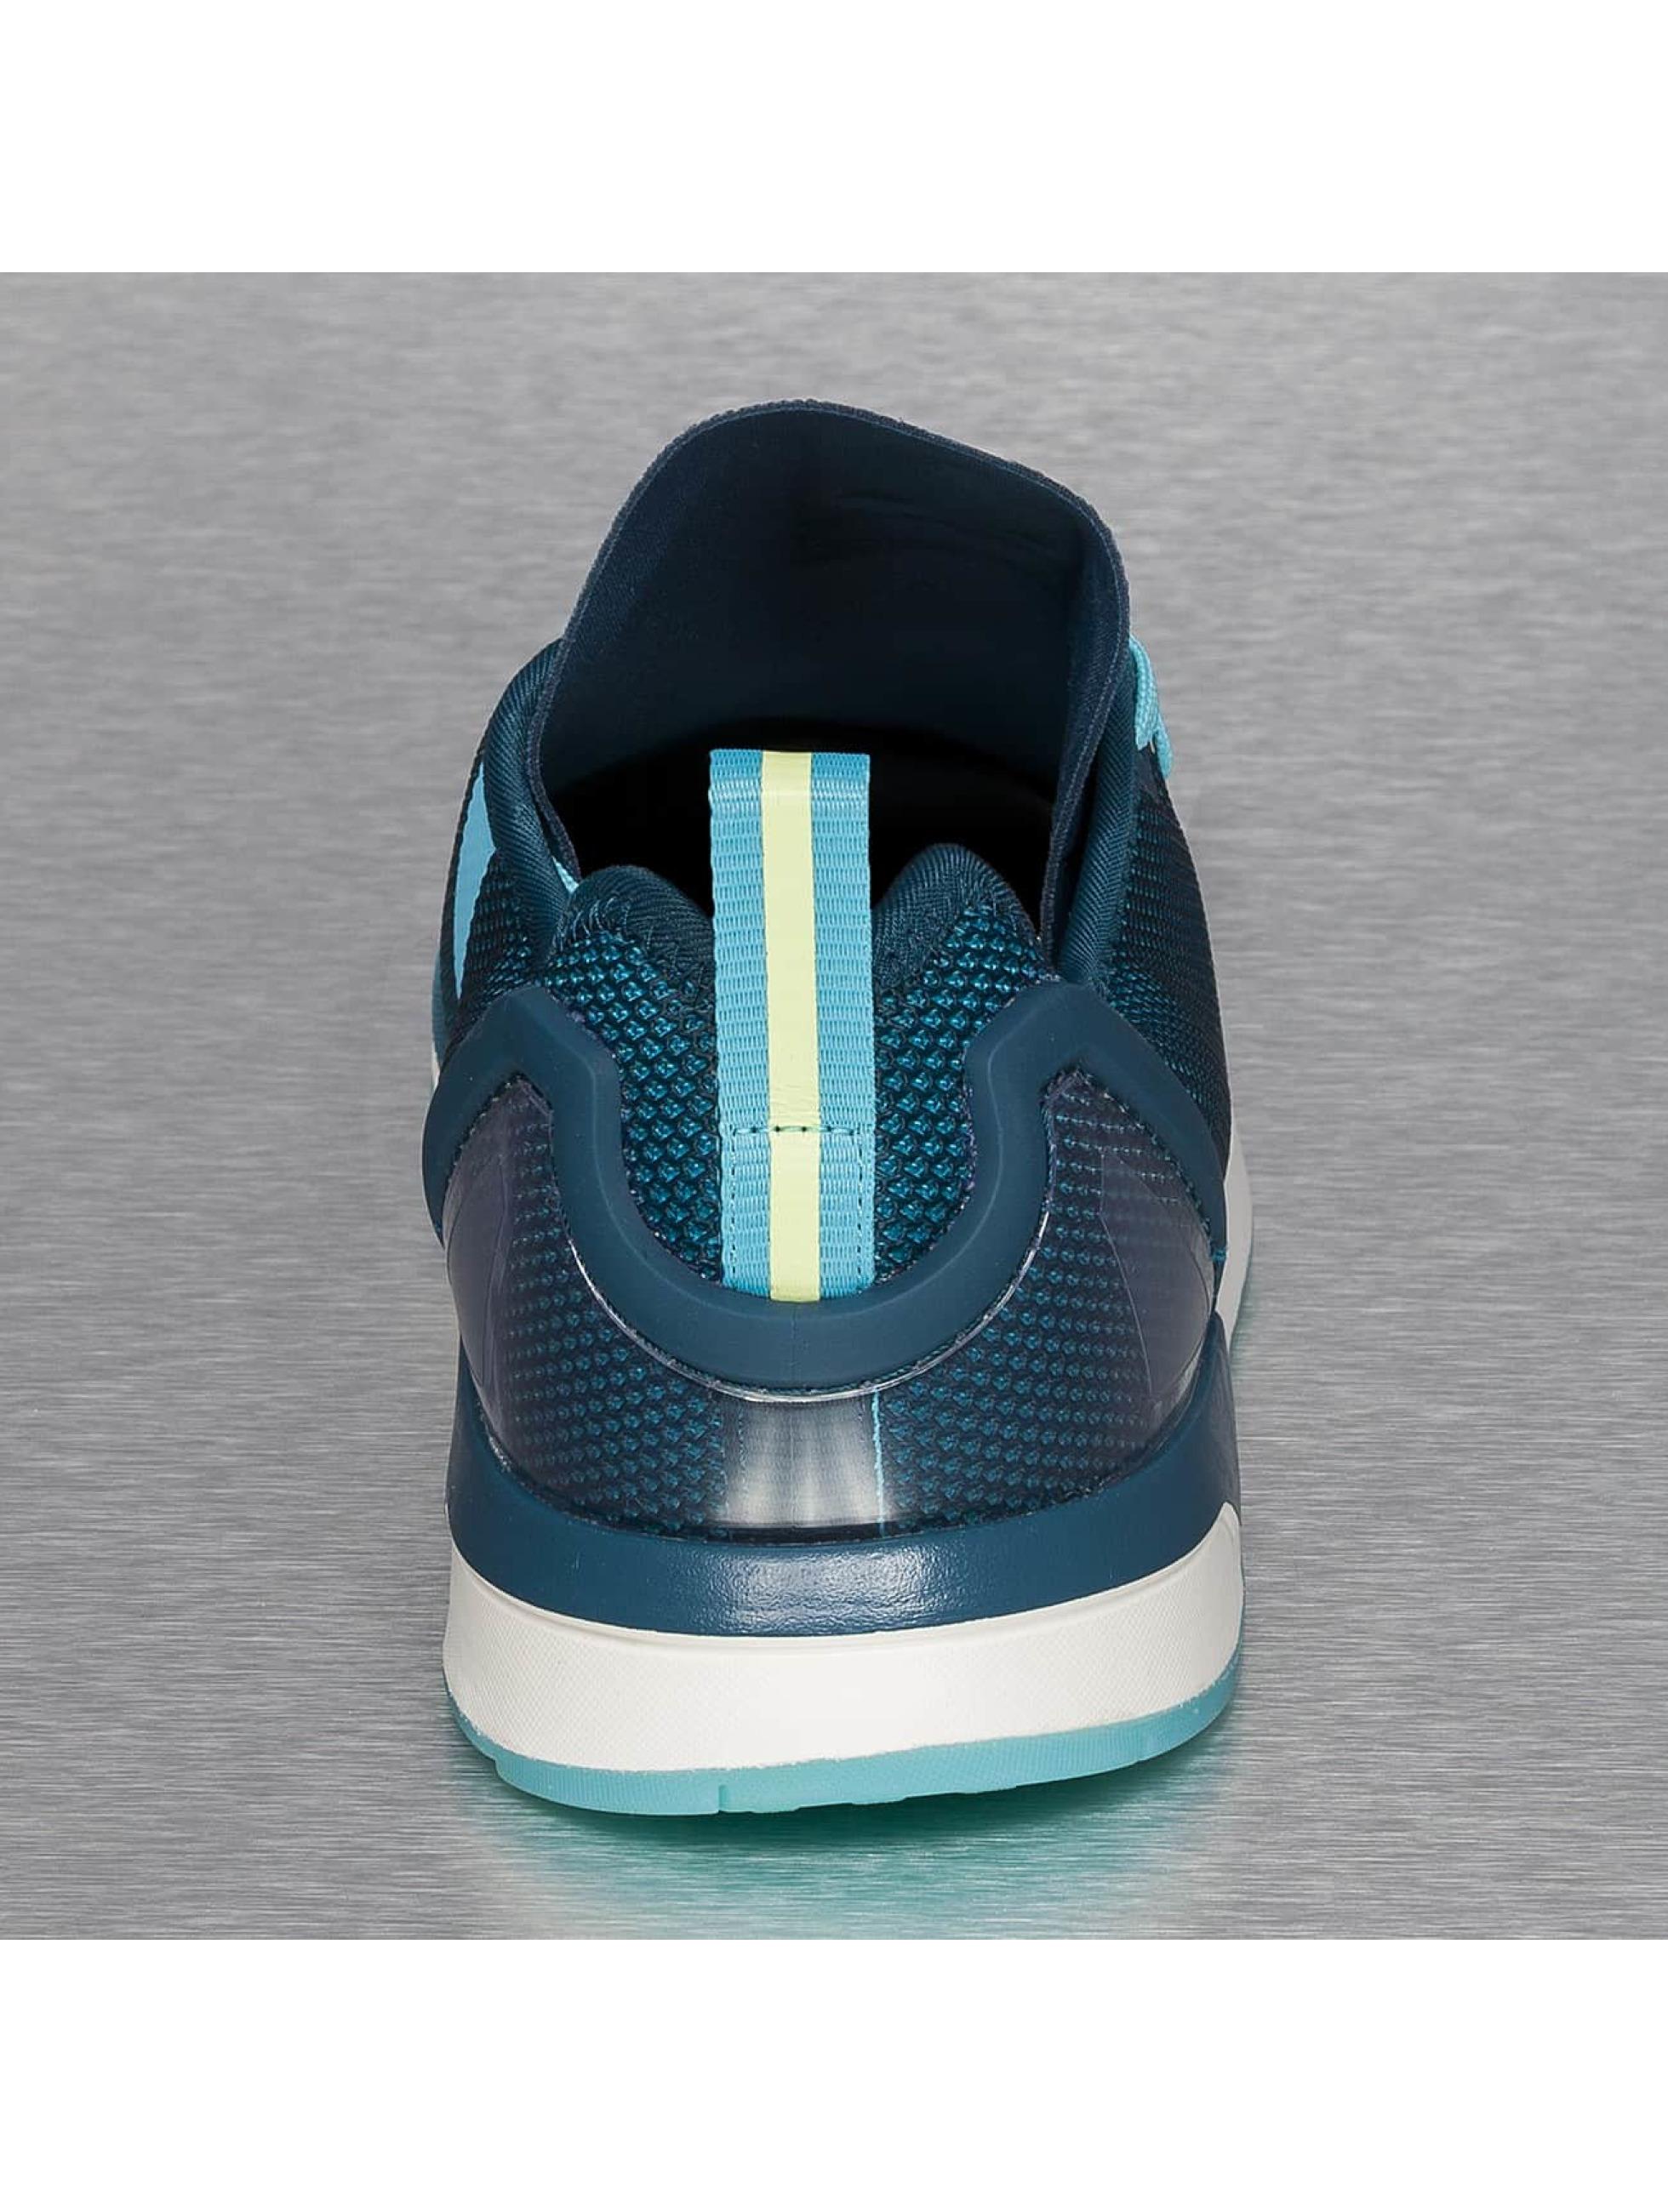 Adidas Sneakers Zwart Met Brons